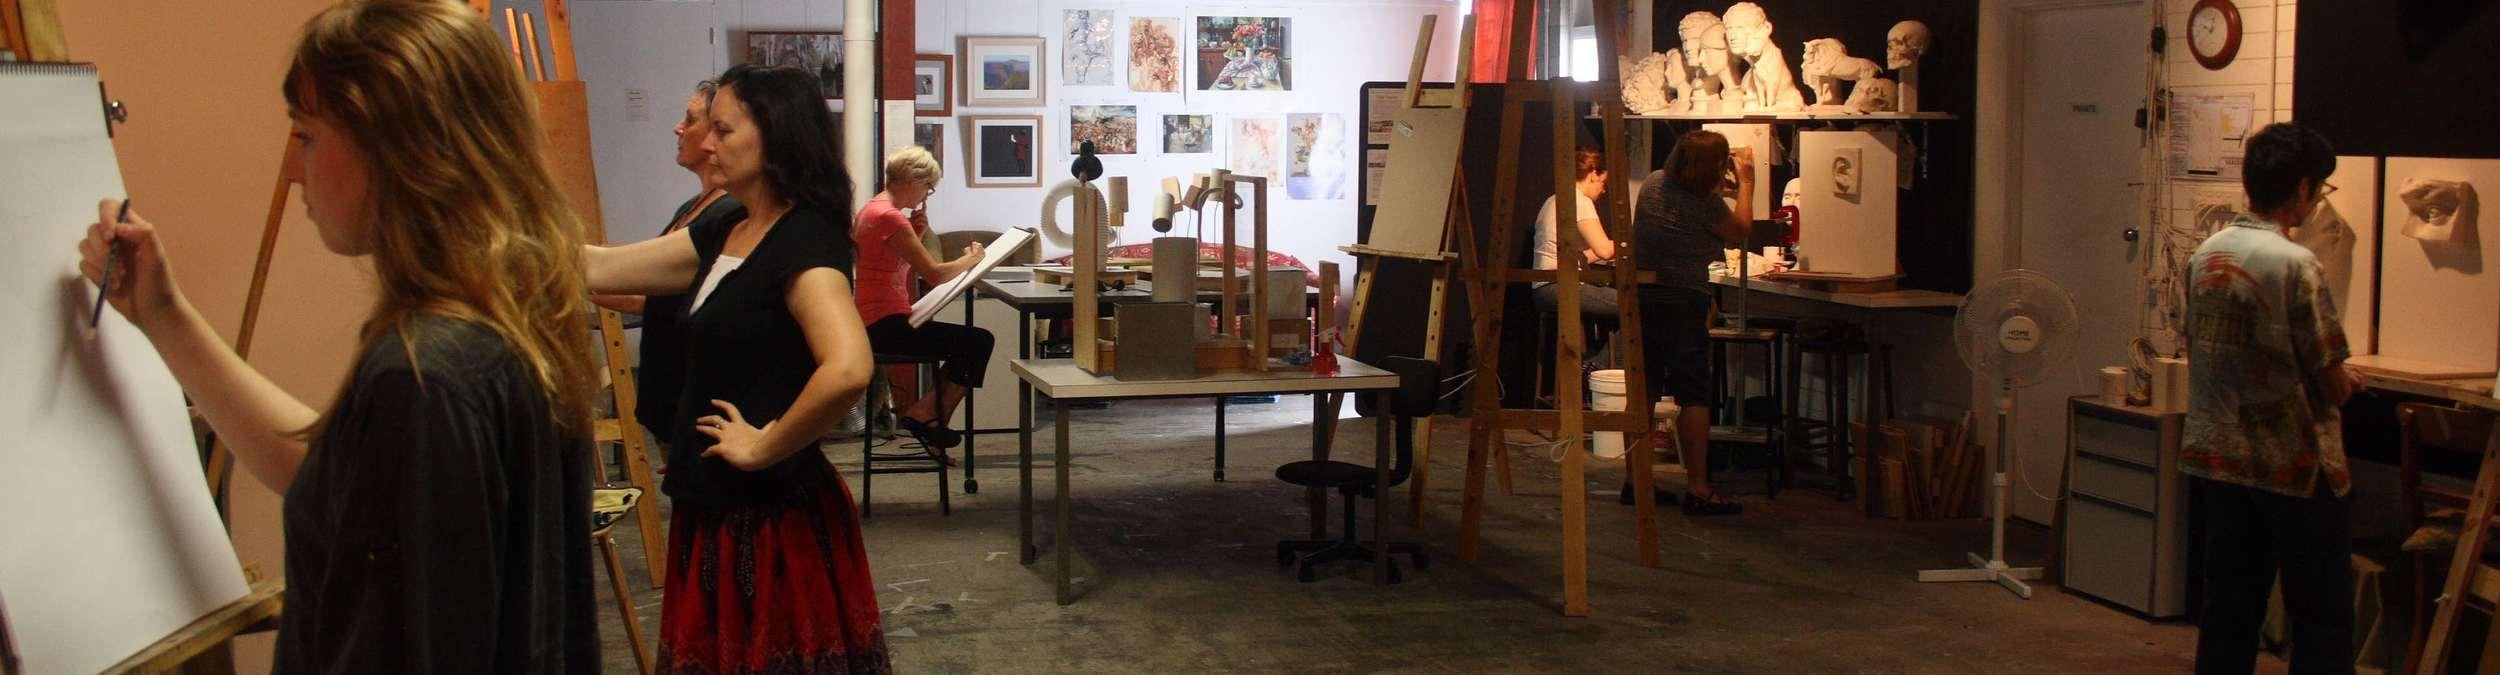 Students in Scott's class at the Atelier Art Classes studio in Salisbury, Brisbane